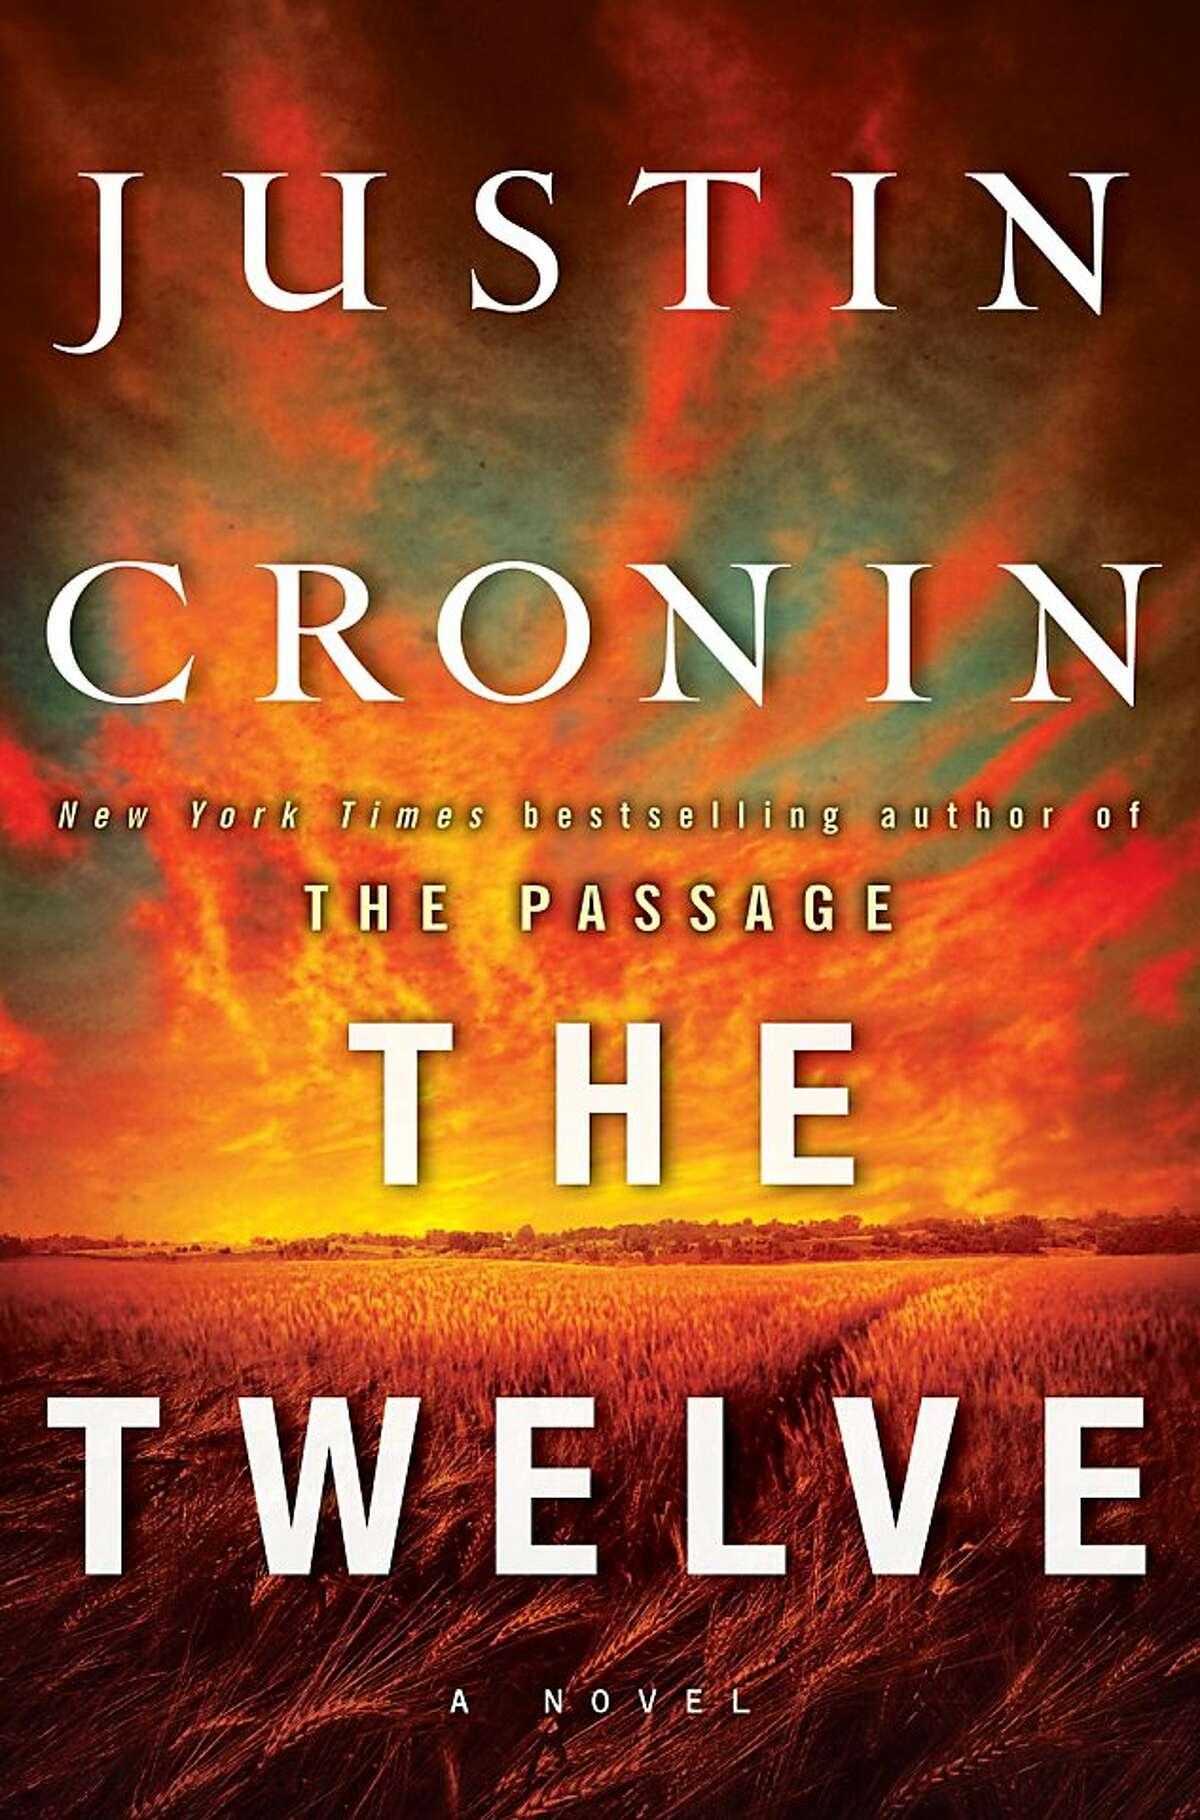 The Twelve, by Justin Cronin